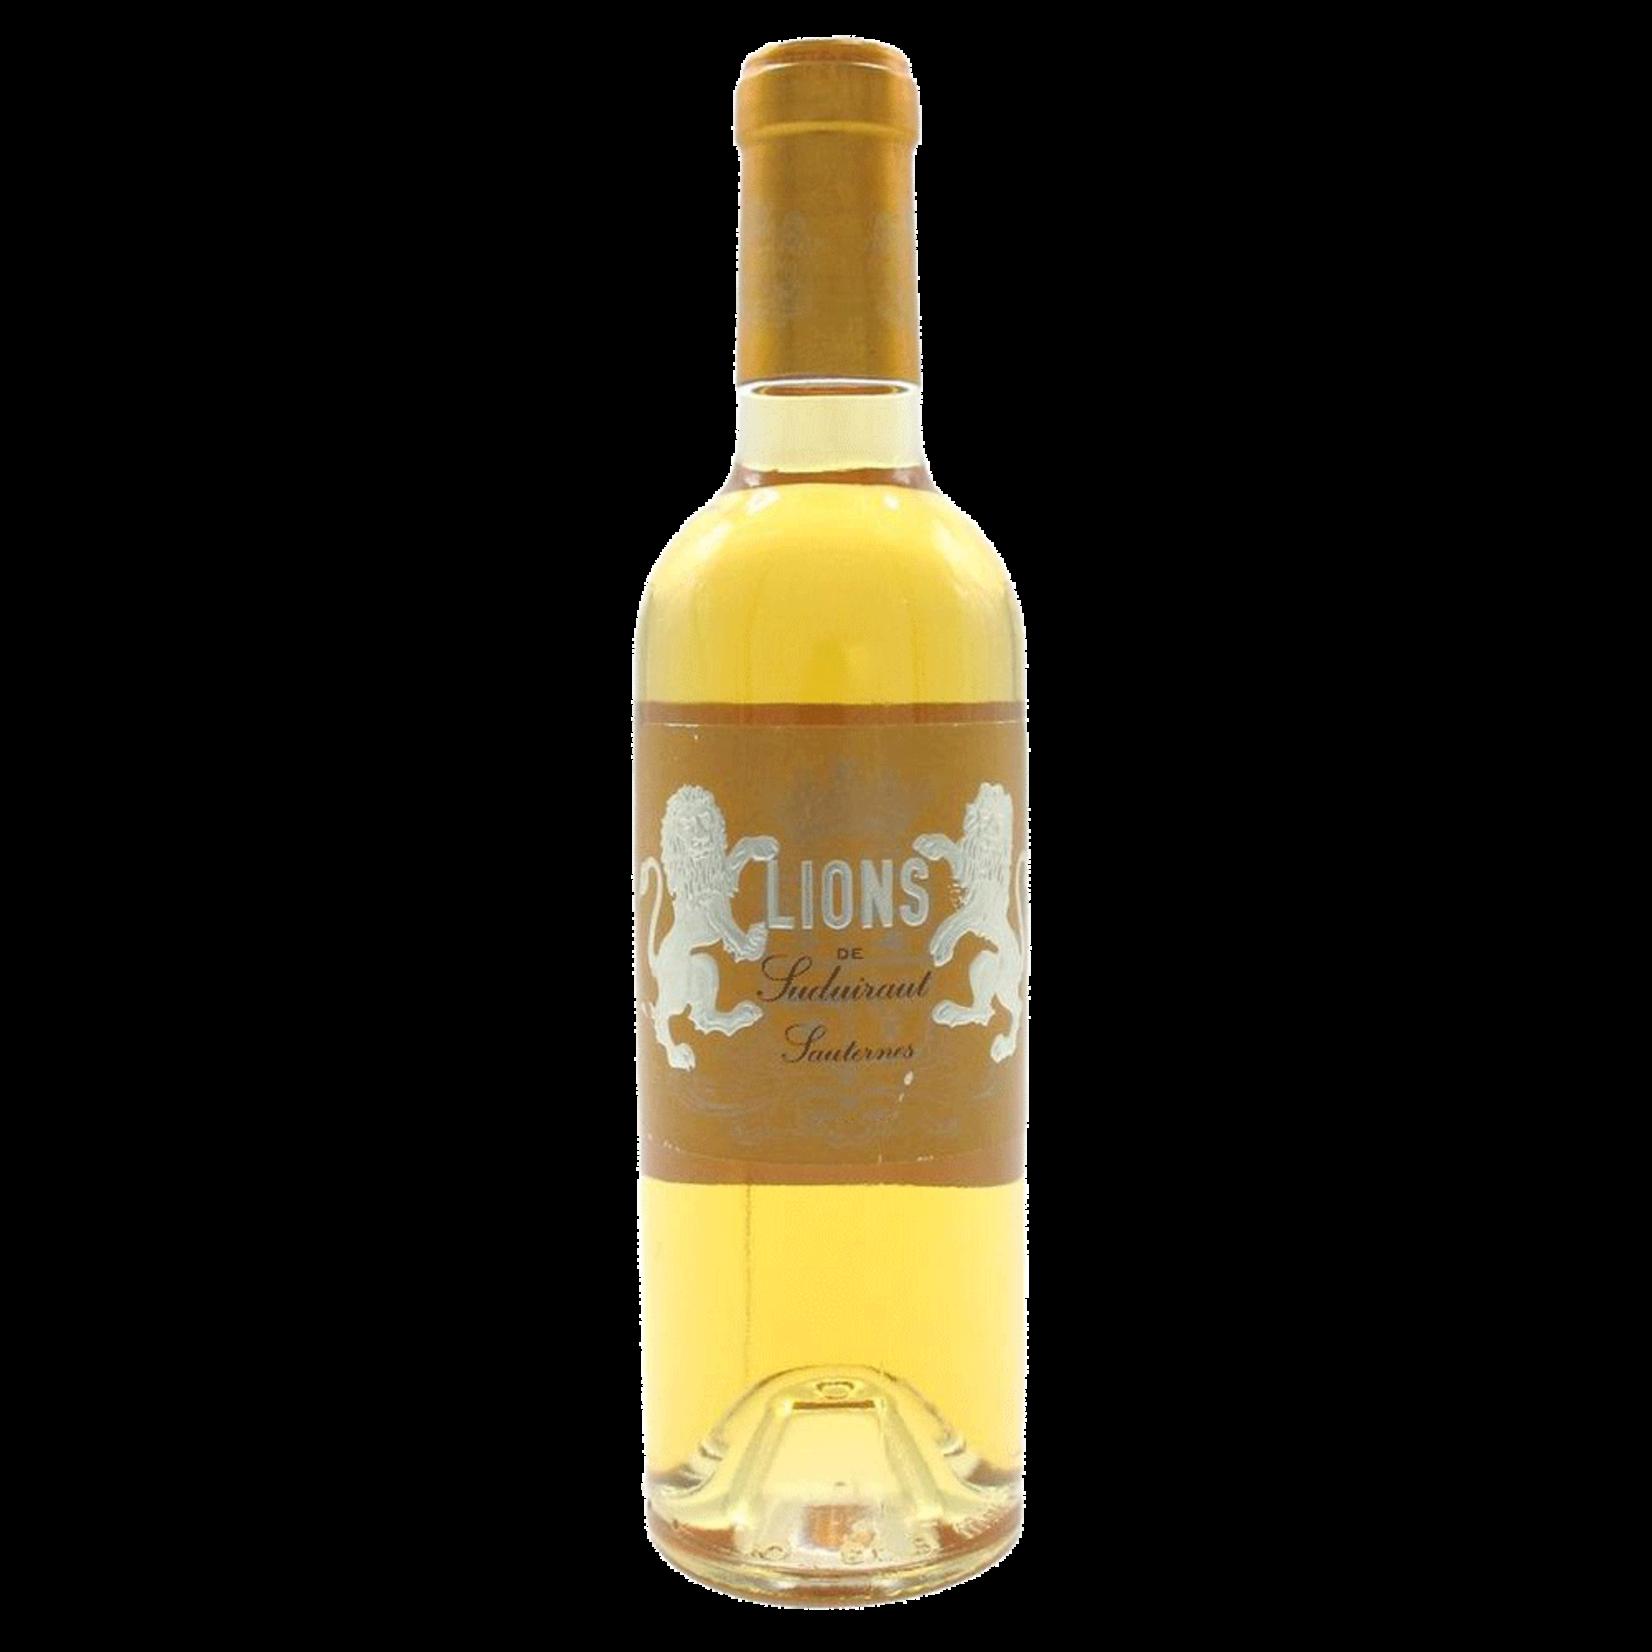 Wine Chateau Suduiraut Sauternes Lions de Suduiraut 2013 375ml